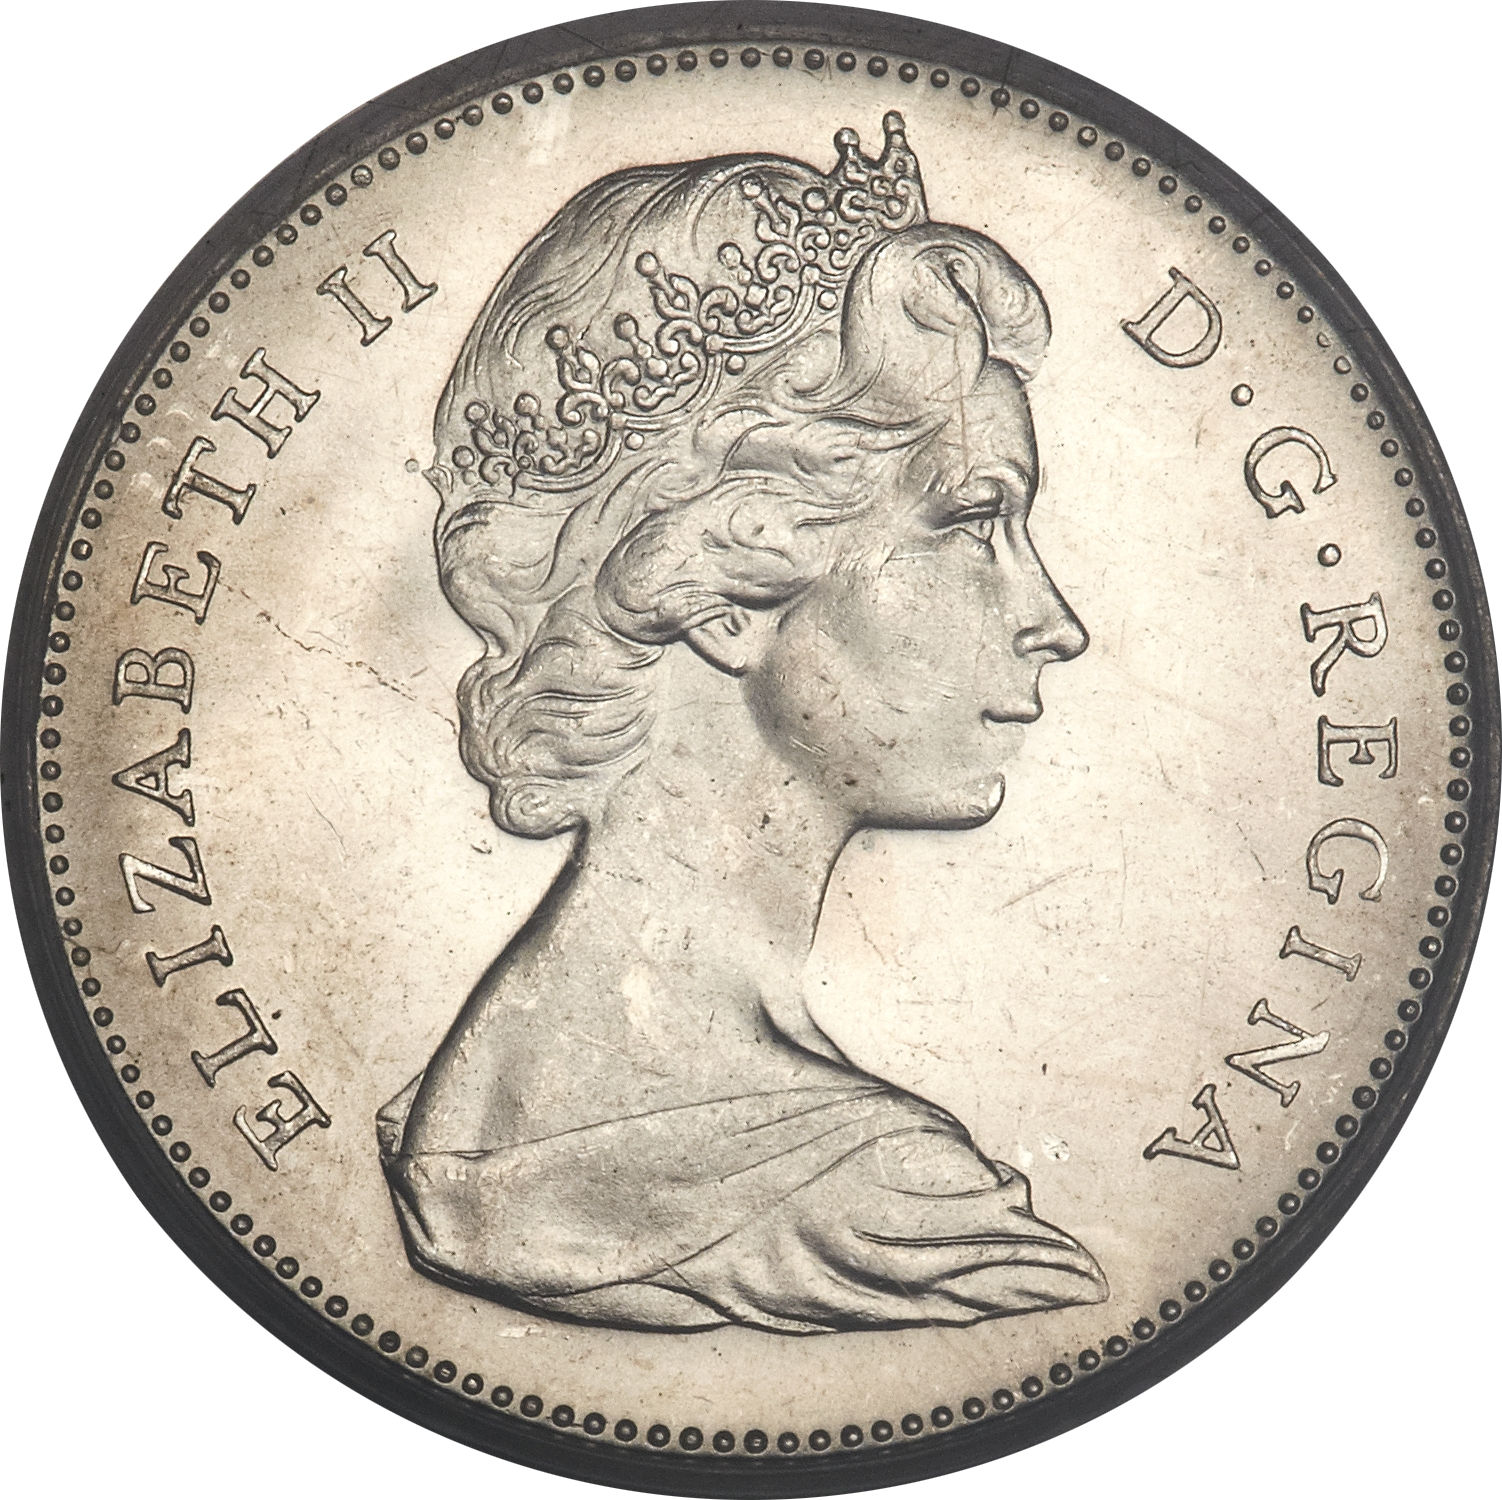 5 Cents - Elizabeth II (2nd portrait) - Canada – Numista